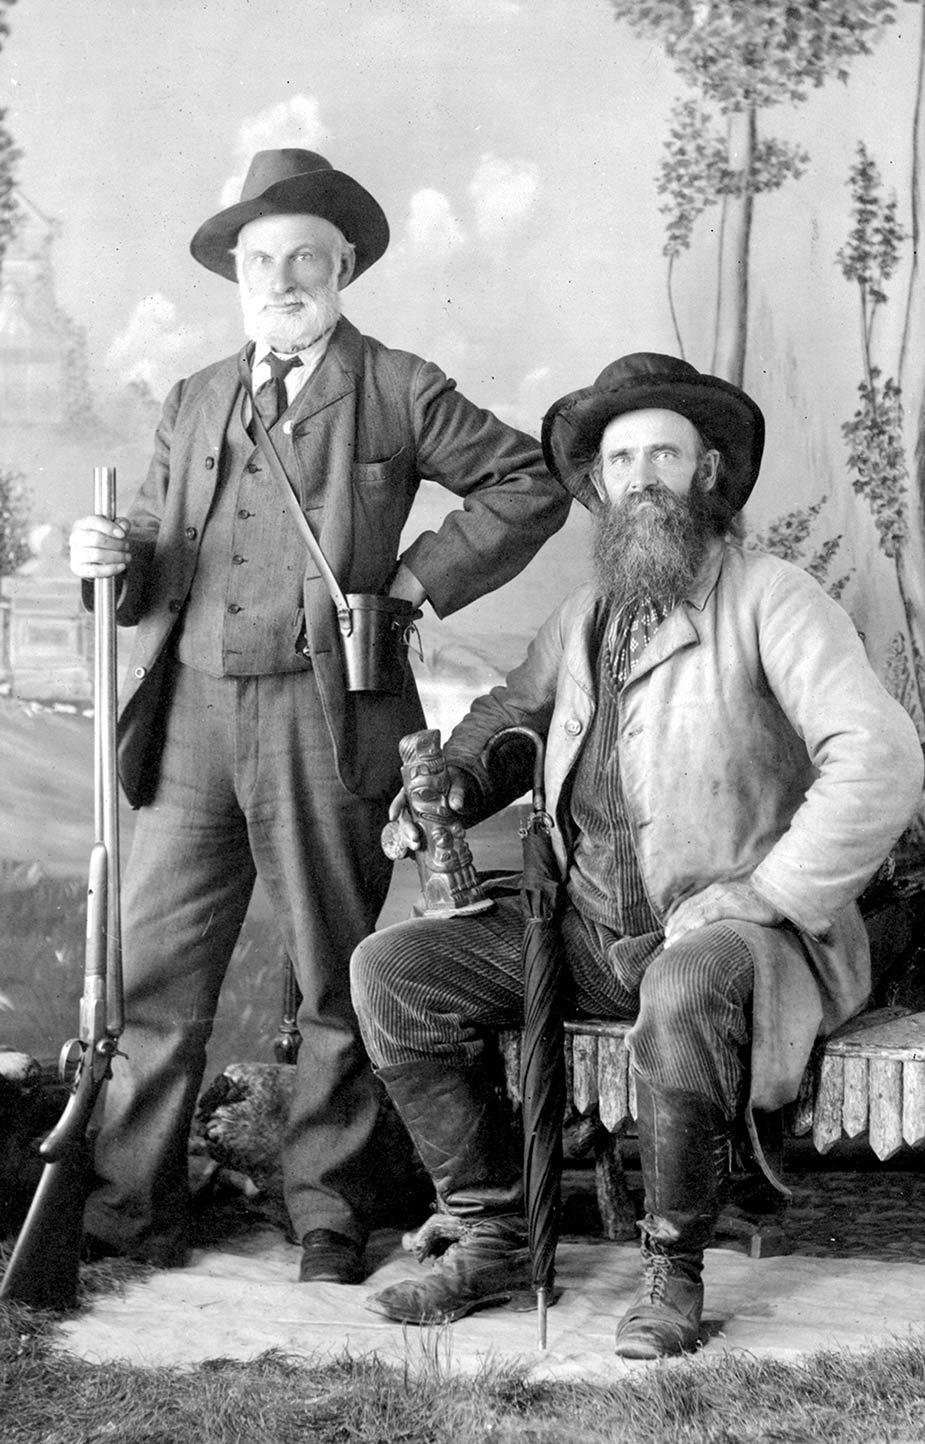 Richard Maynard and Captain Newton H. Chittenden